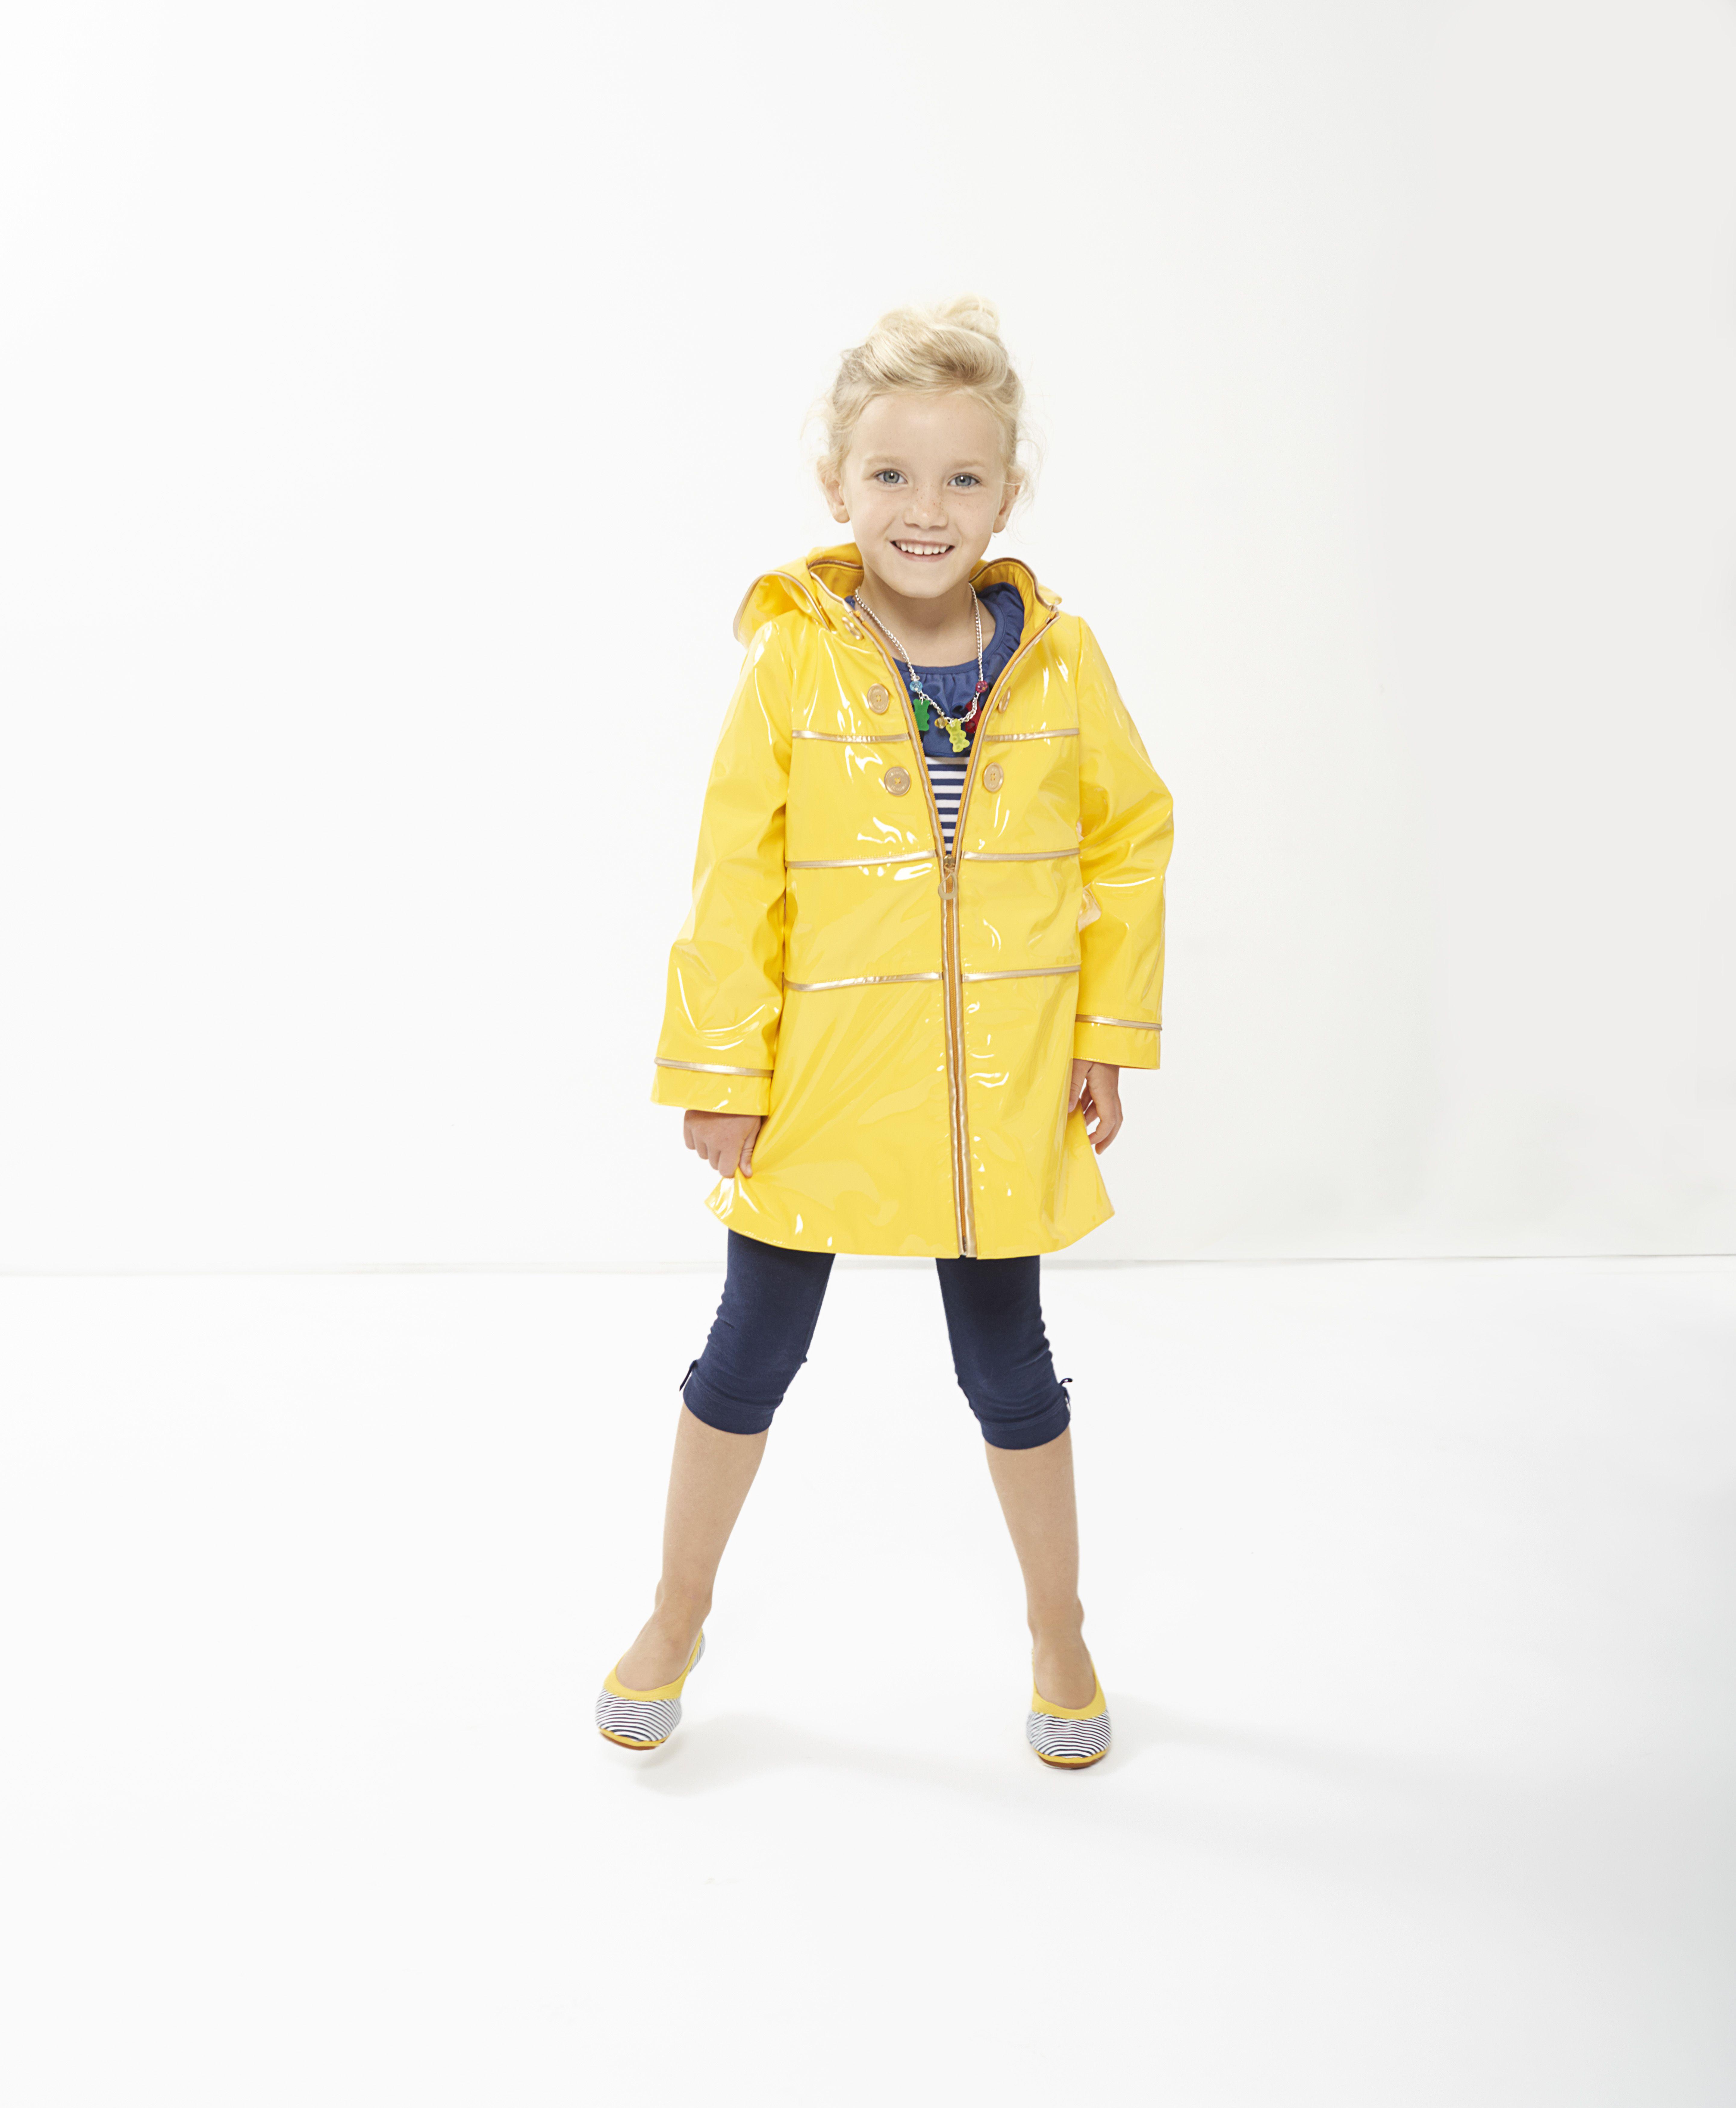 Yellow Rain Jacket By Oil Water Rainwear Kidsfashion Style Childstyle Www Oilandwater Com Cute Raincoats Raincoat Kids Kids Outerwear [ 7000 x 5766 Pixel ]